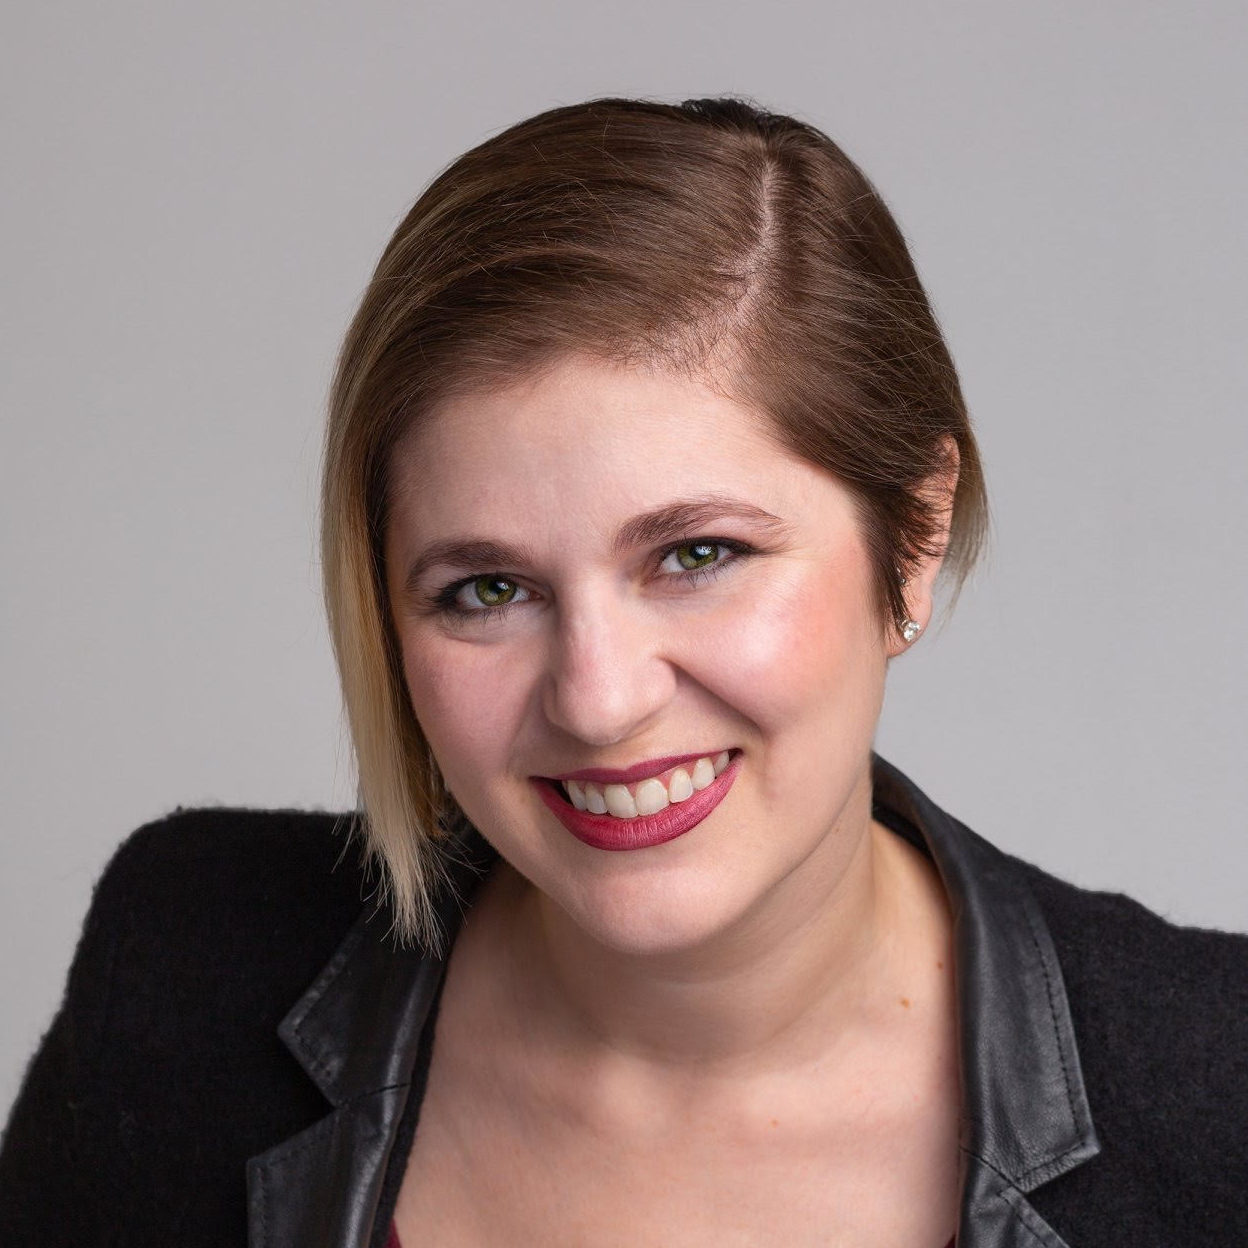 Laura Knotts